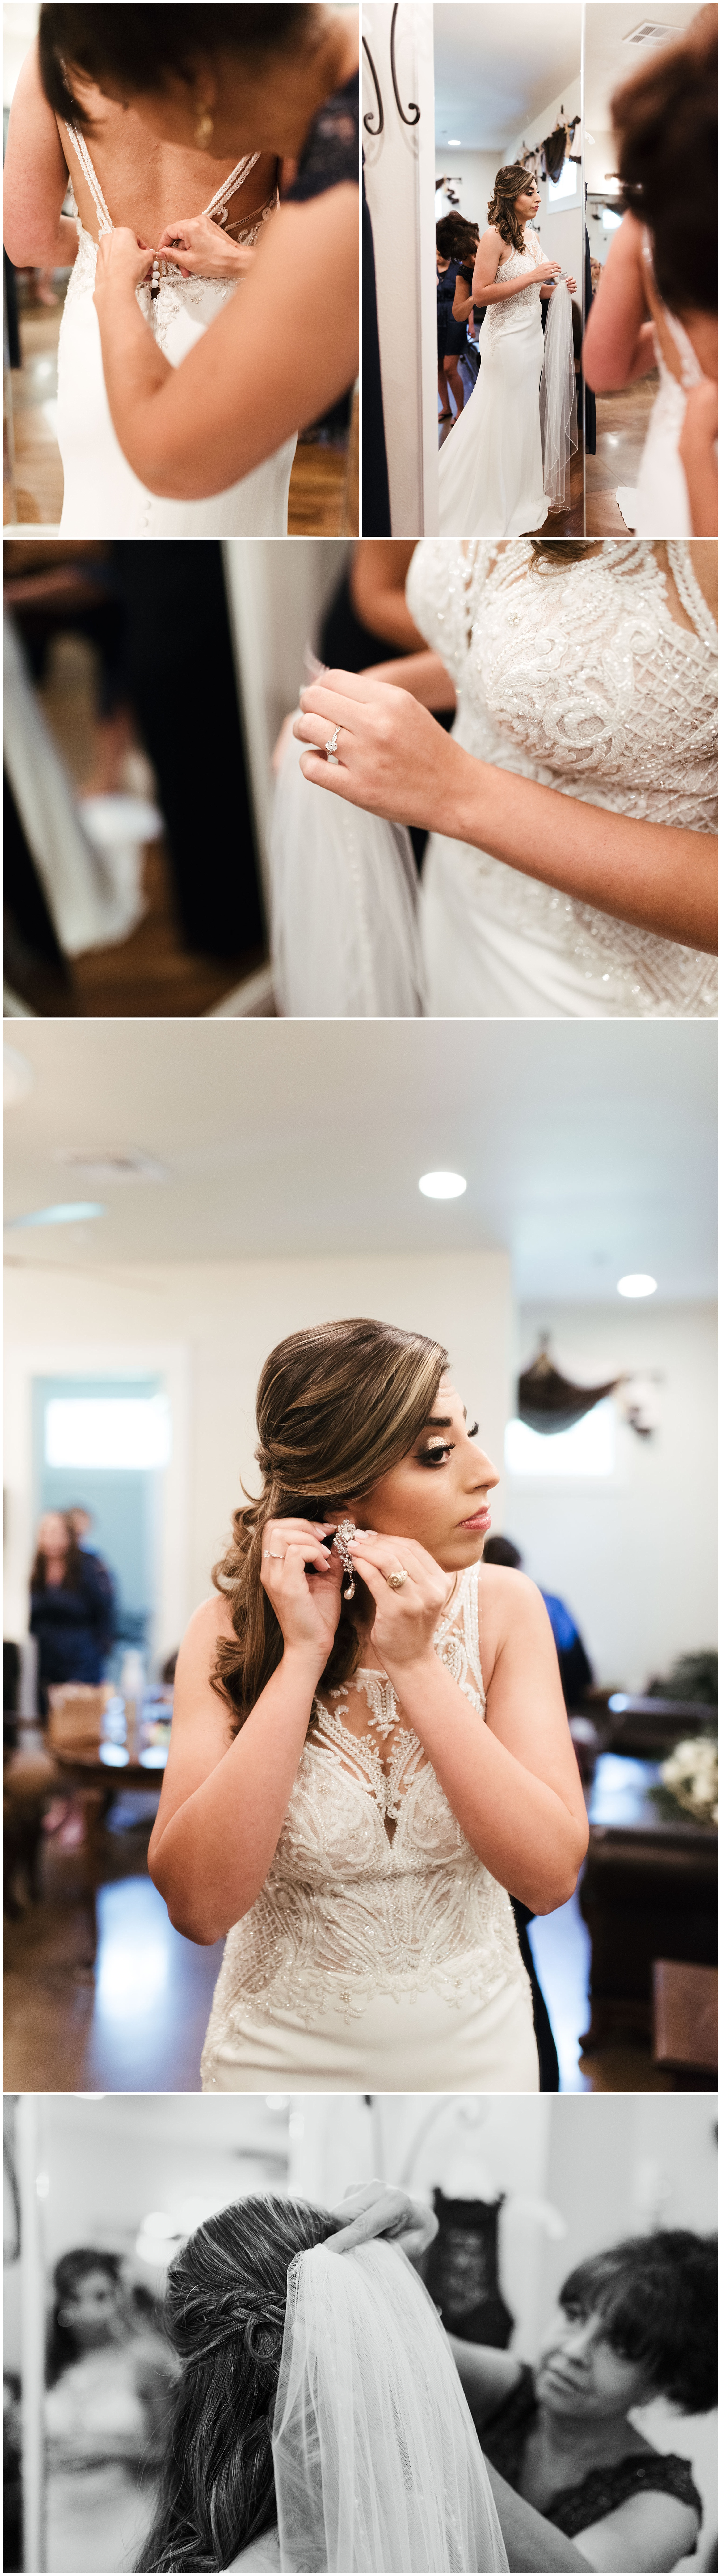 Magnolia Manor Wedding | Fort Worth Wedding Photographer | Dallas Wedding Photographer |www.jordanmitchellphotography.com